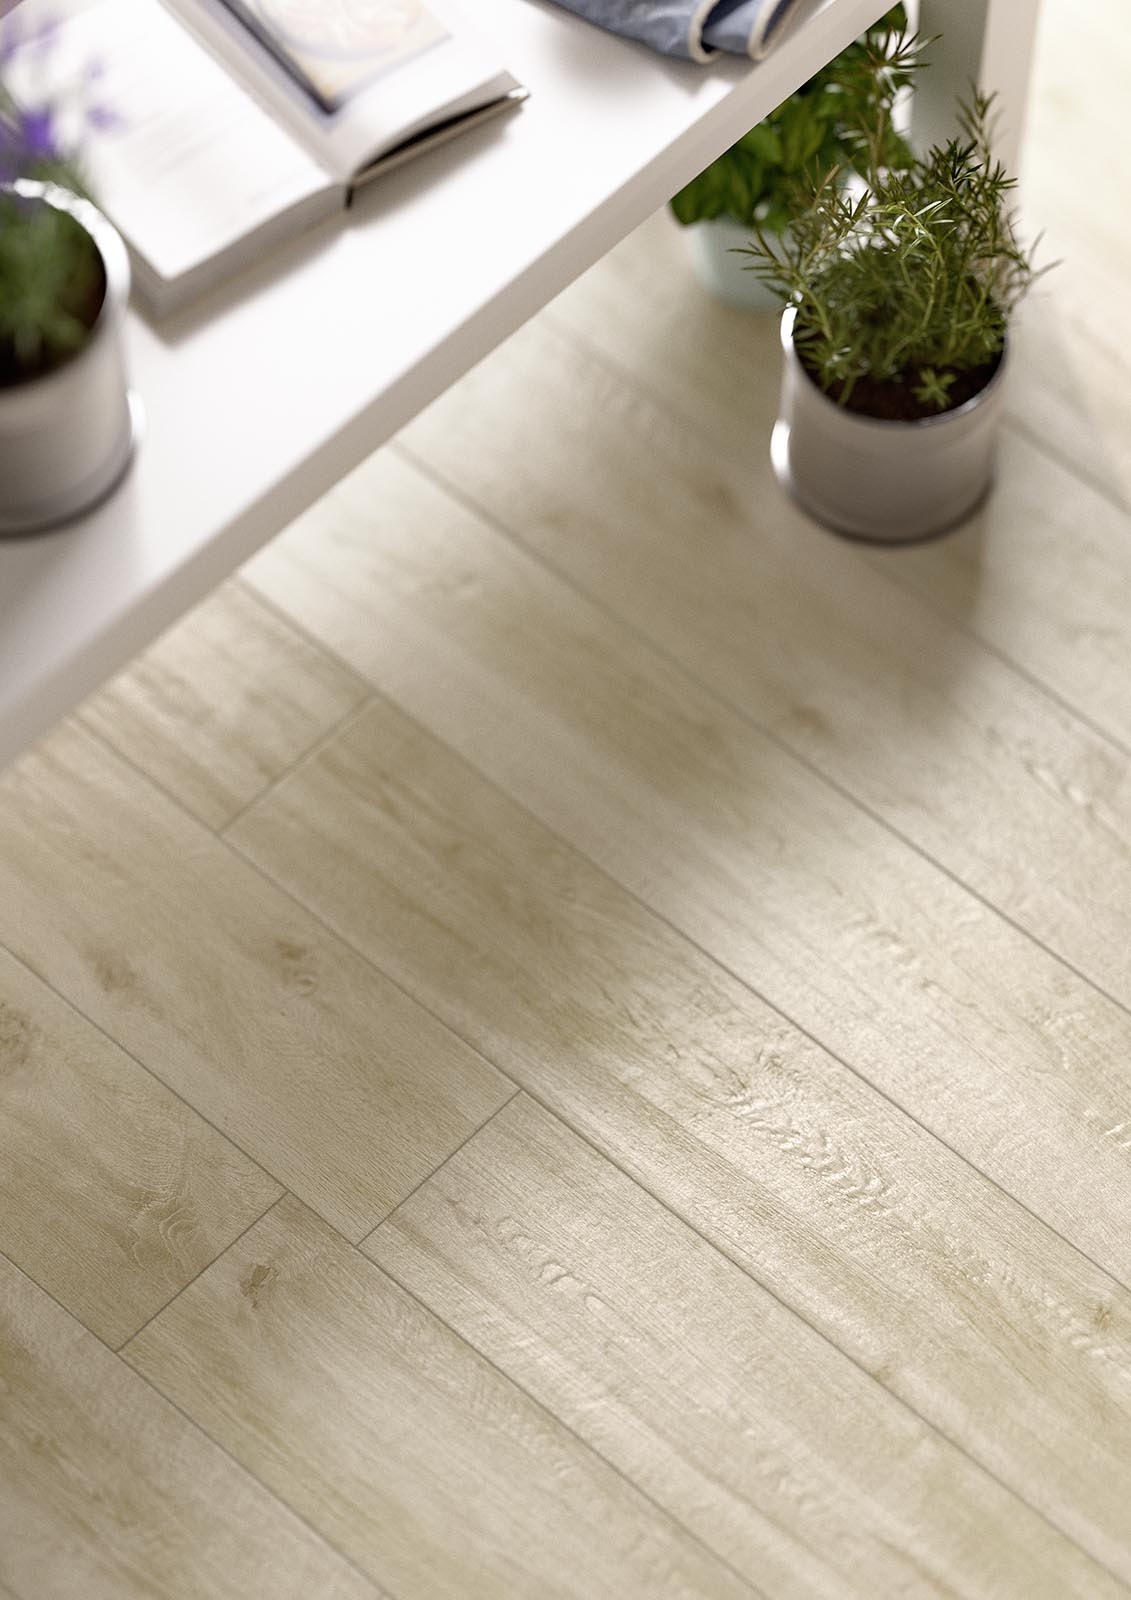 Treverkway pavimento in gres effetto legno marazzi for Pavimento gres